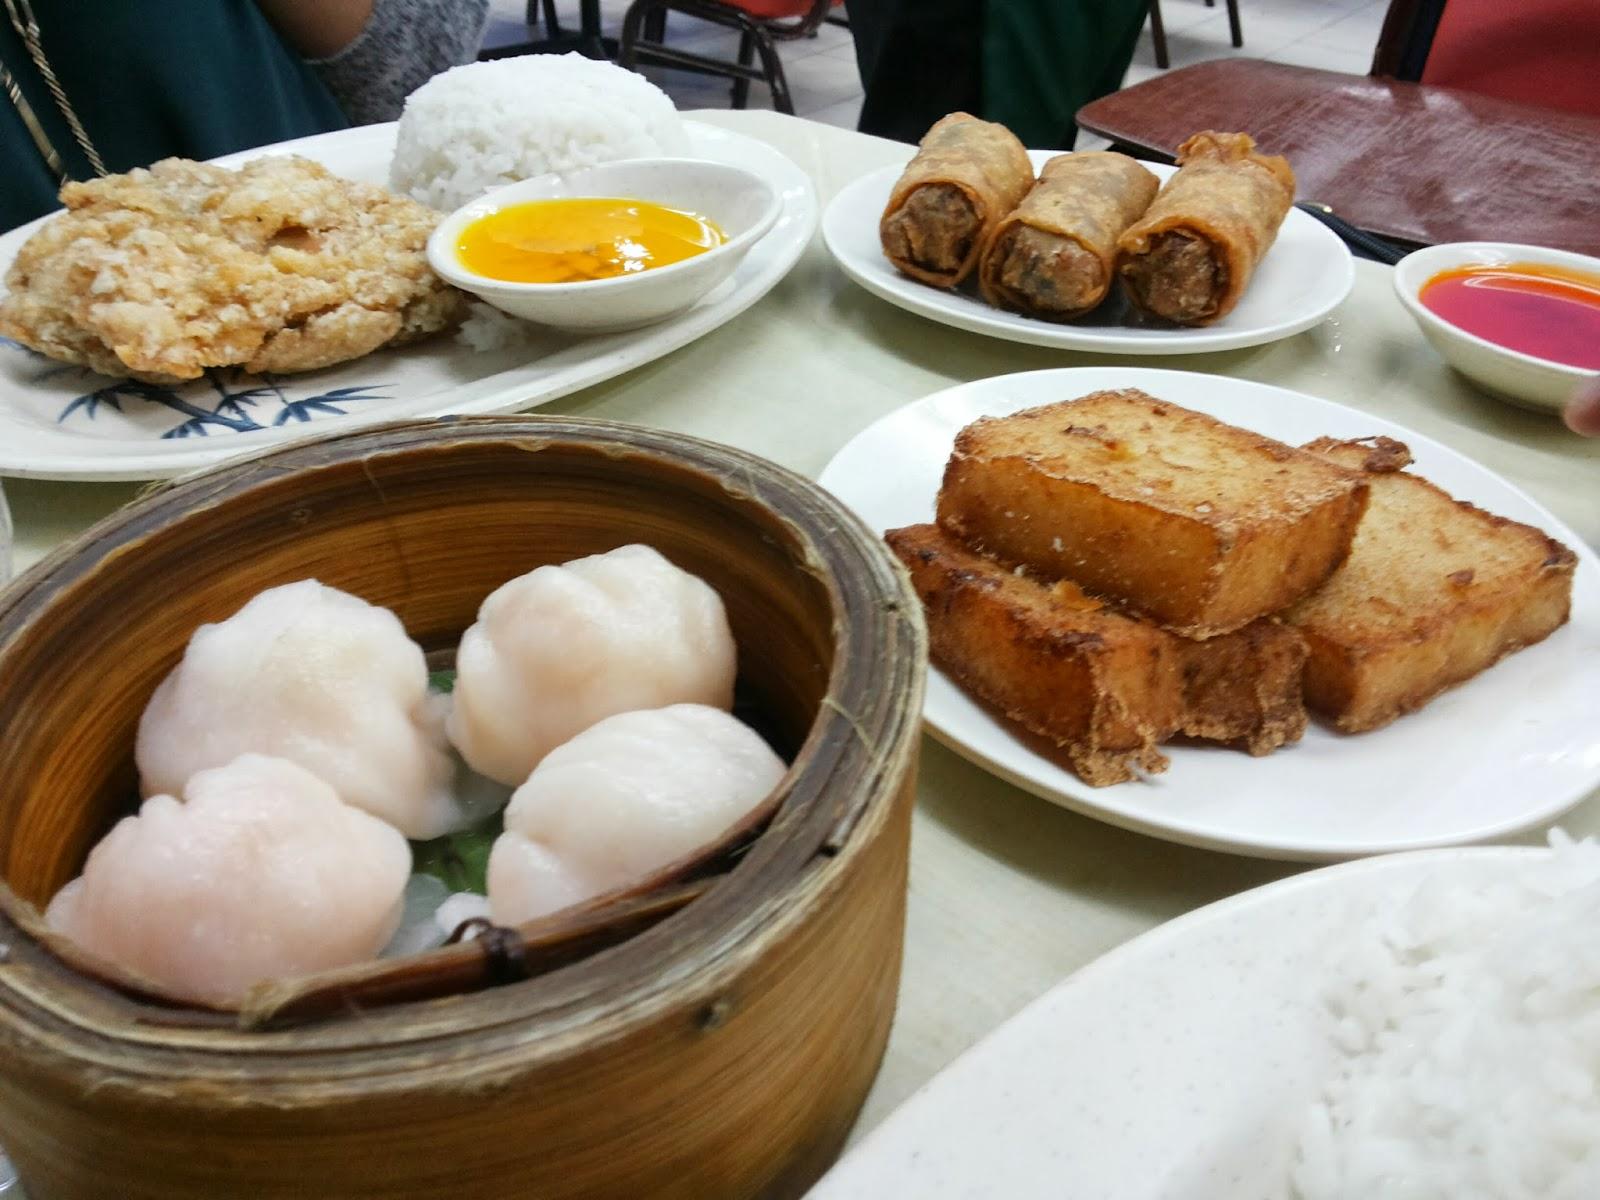 Wai Ying | Awesome in Manila